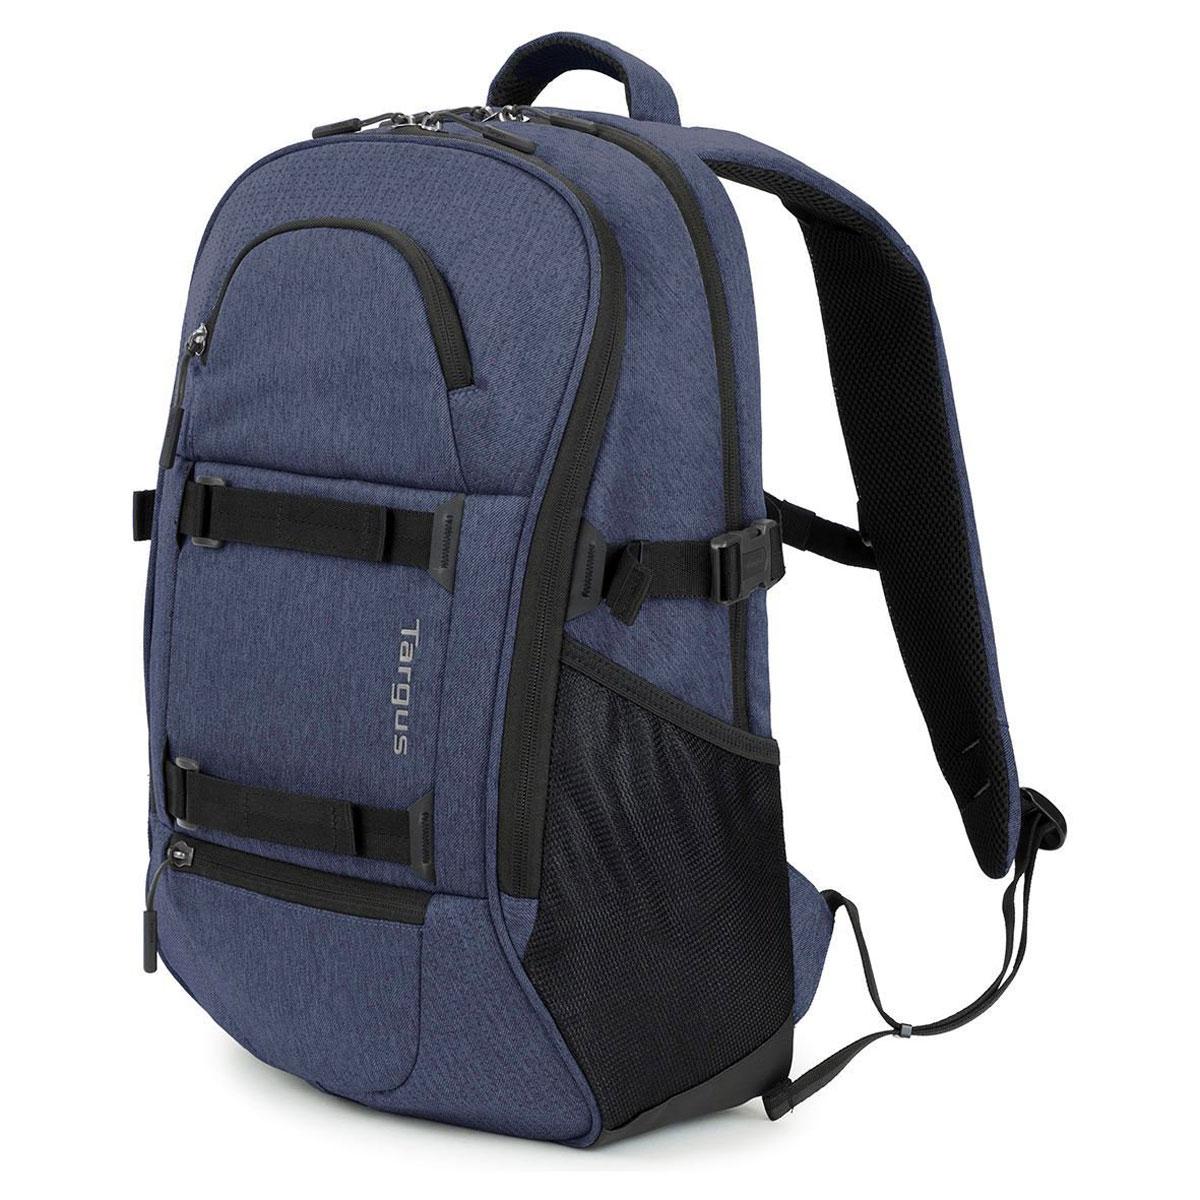 Sac à dos ordinateur Targus Urban Explorer 15.6 pouces Bleu hJX3A